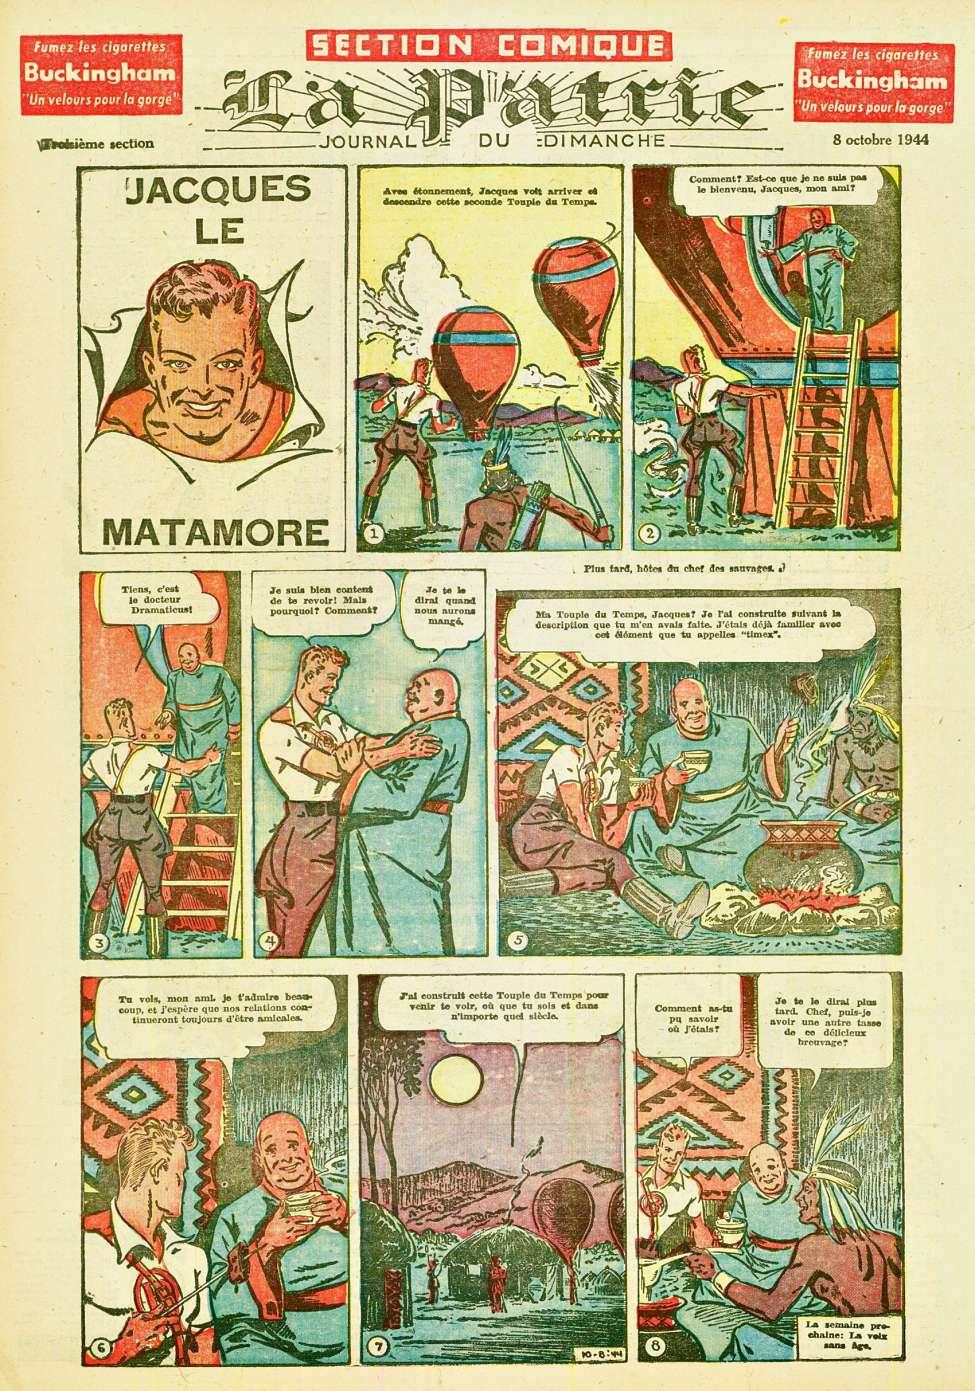 Comic Book Cover For La Patrie - Section Comique (1944-10-08)